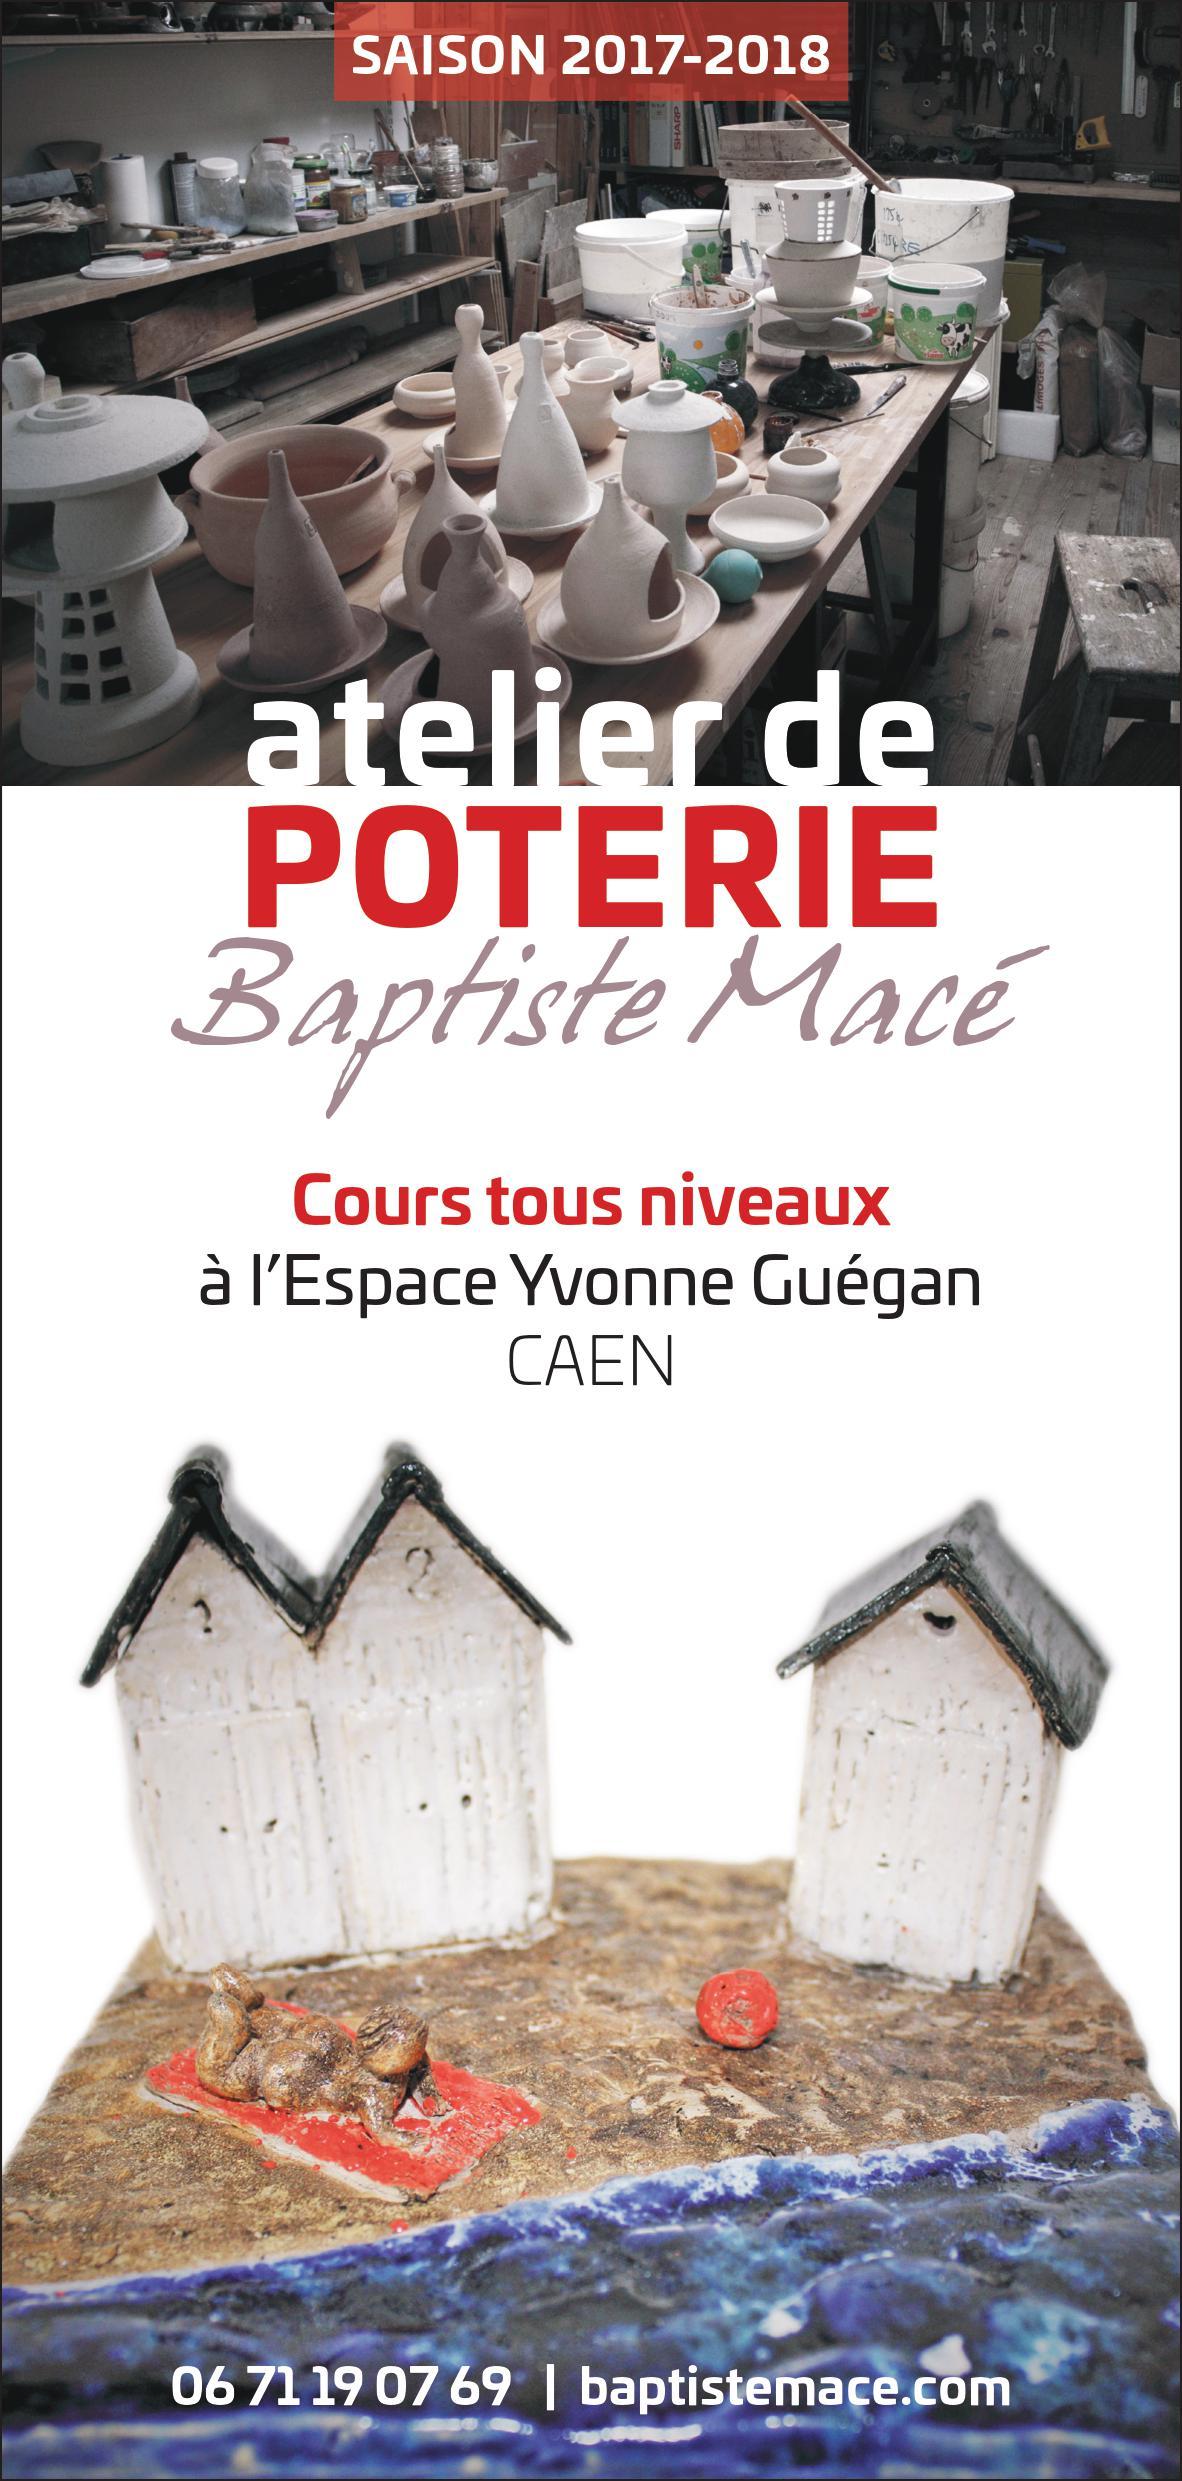 atelier-baptiste-mace-2017-2018